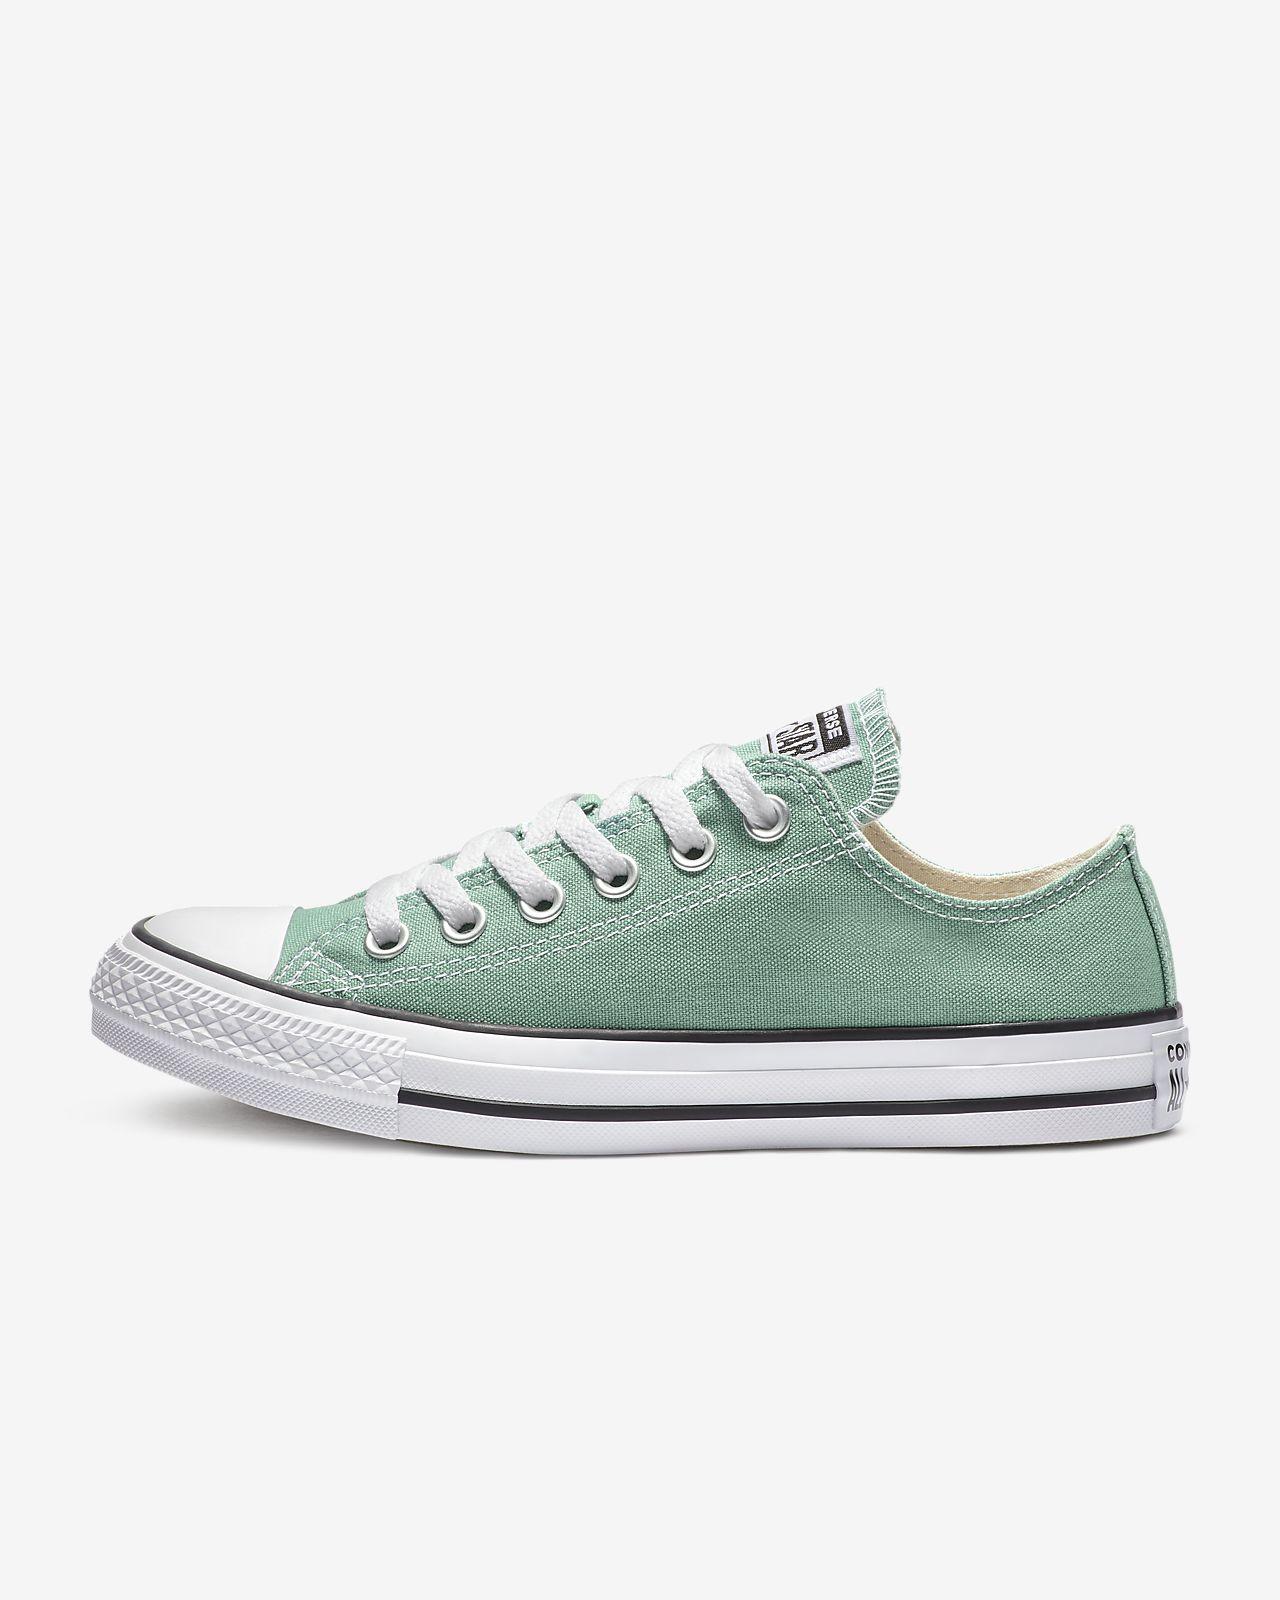 Chuck Taylor All Star Seasonal Color Low Top  Unisex Shoe